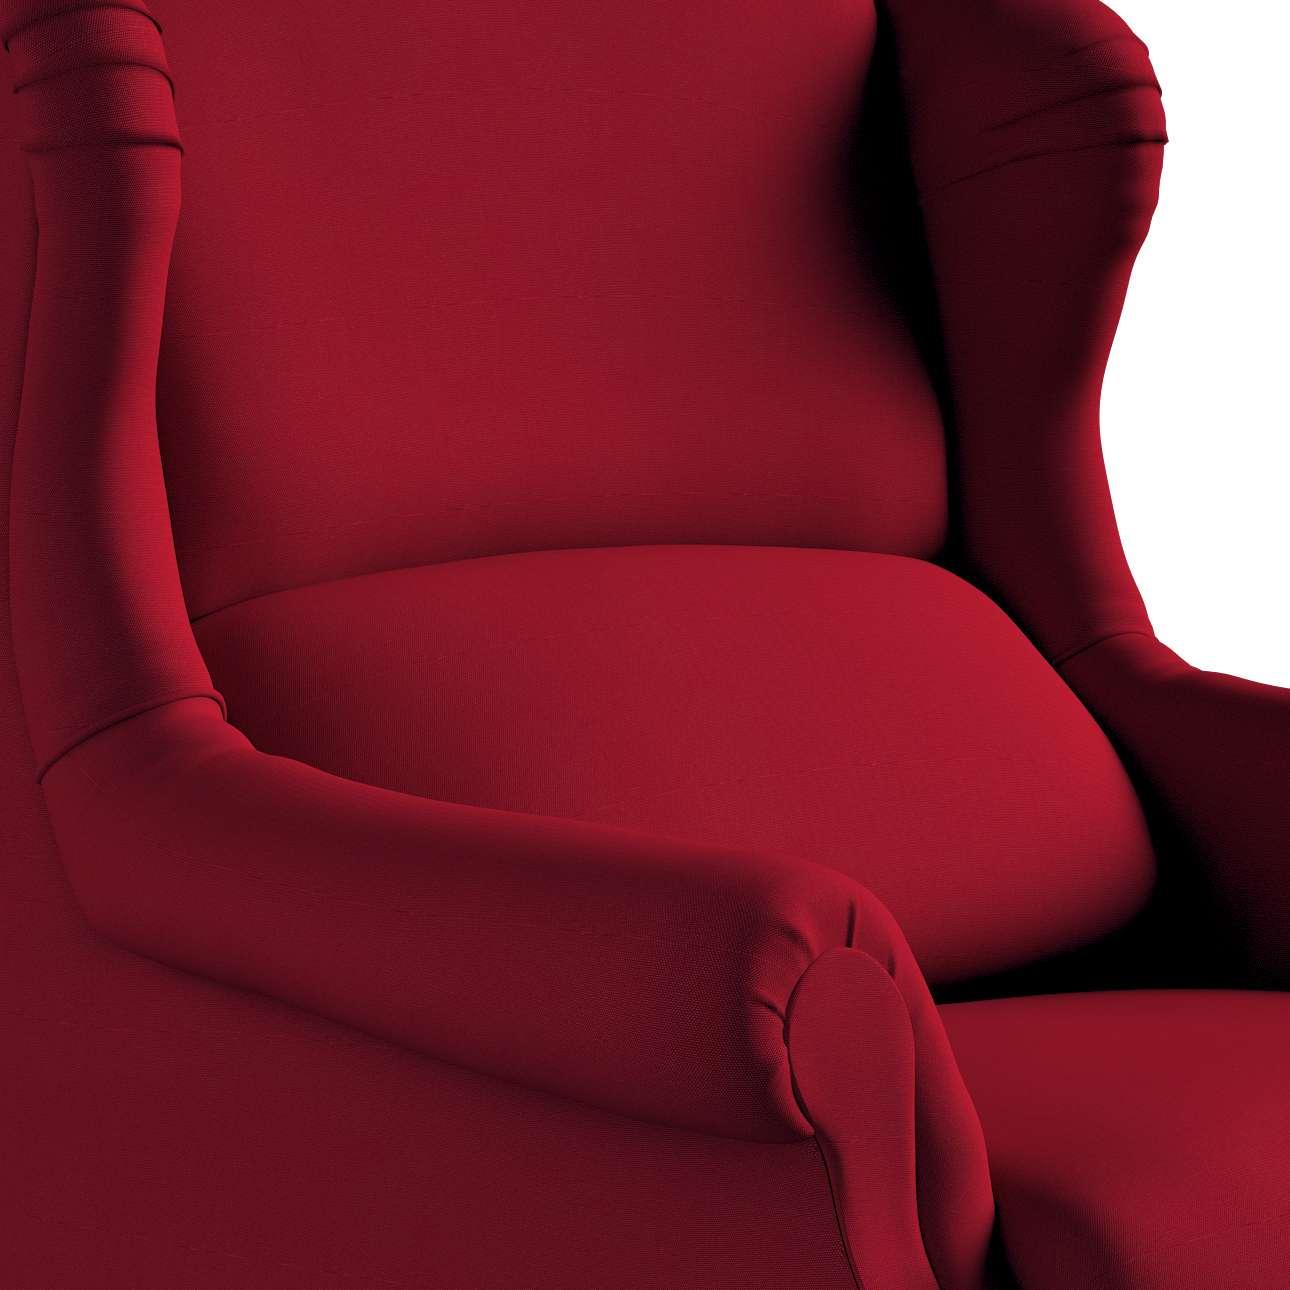 Fotel Unique w kolekcji Etna, tkanina: 705-60